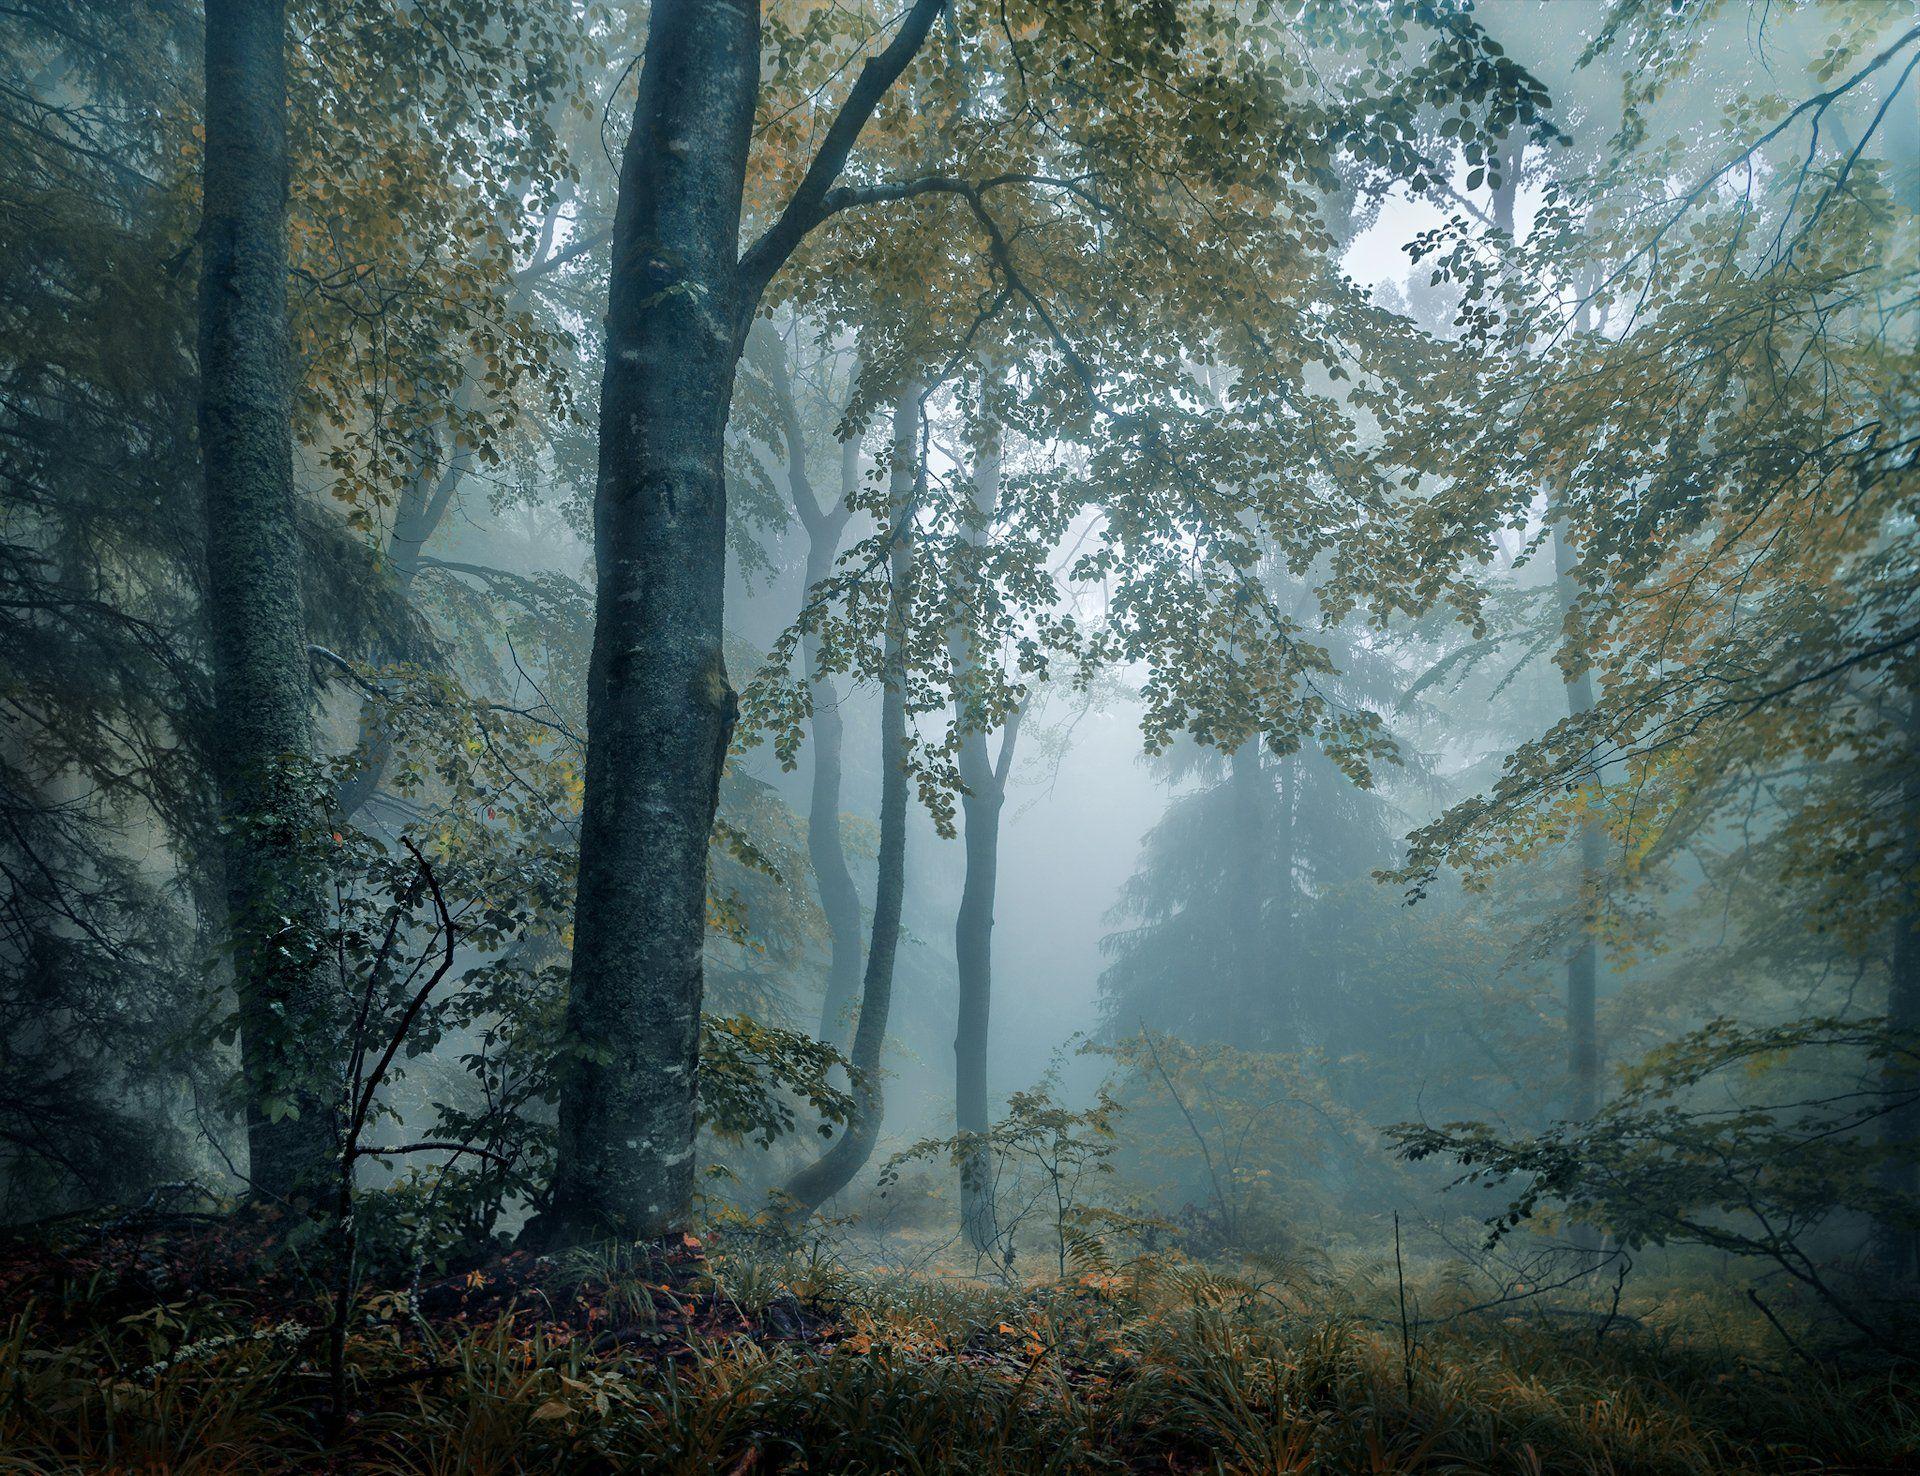 landscape nature scenery forest wood  mist misty fog foggy longexposure mountain vitosha bulgaria туман лес, Александров Александър